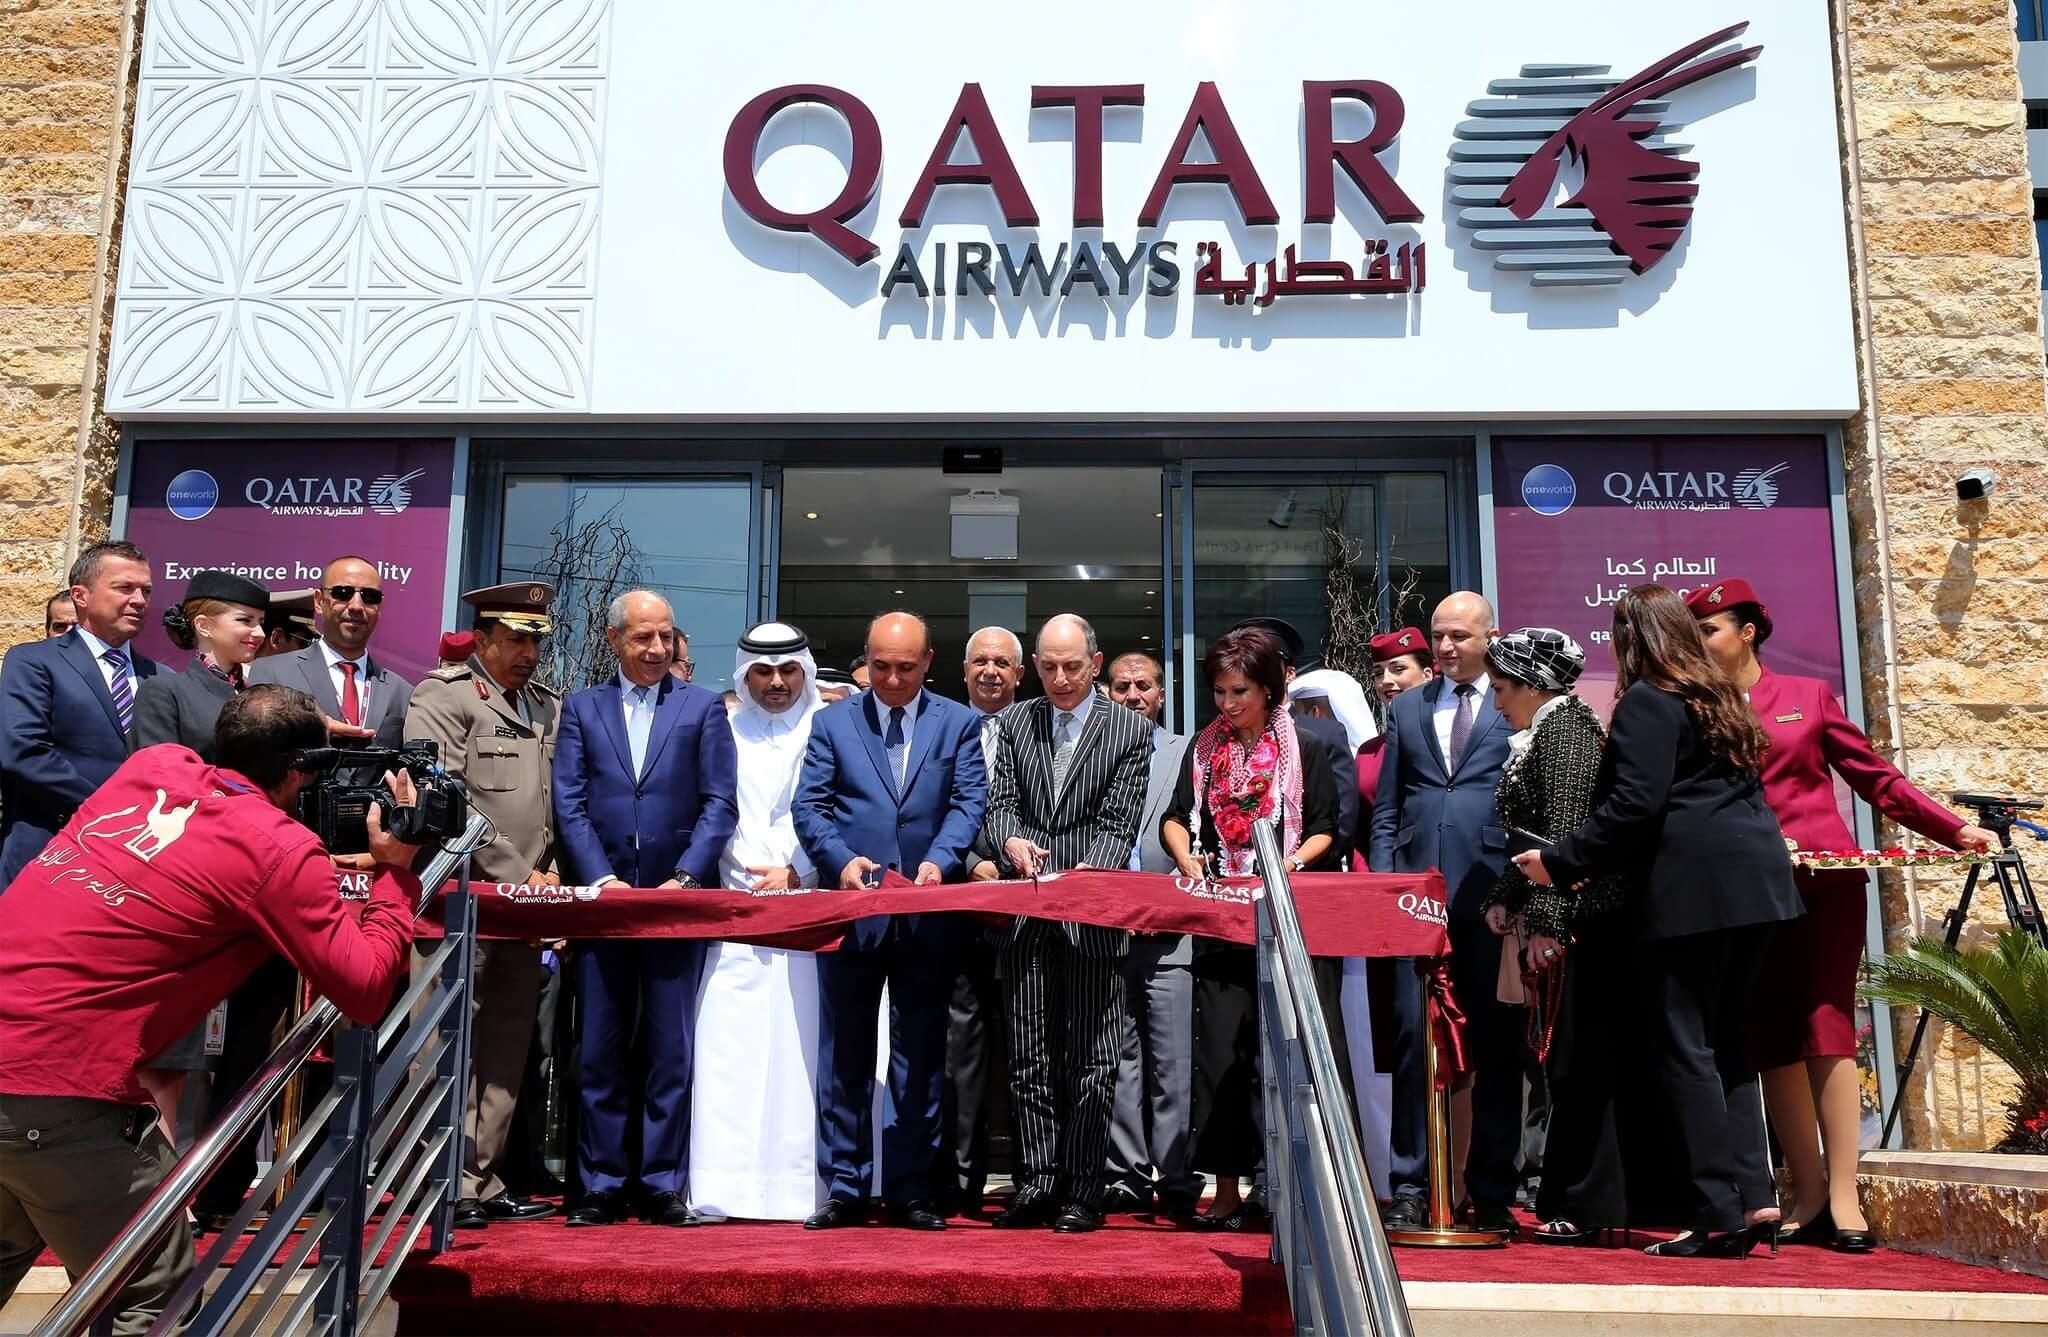 Qatar Airways opens new office in Amman, Jordan